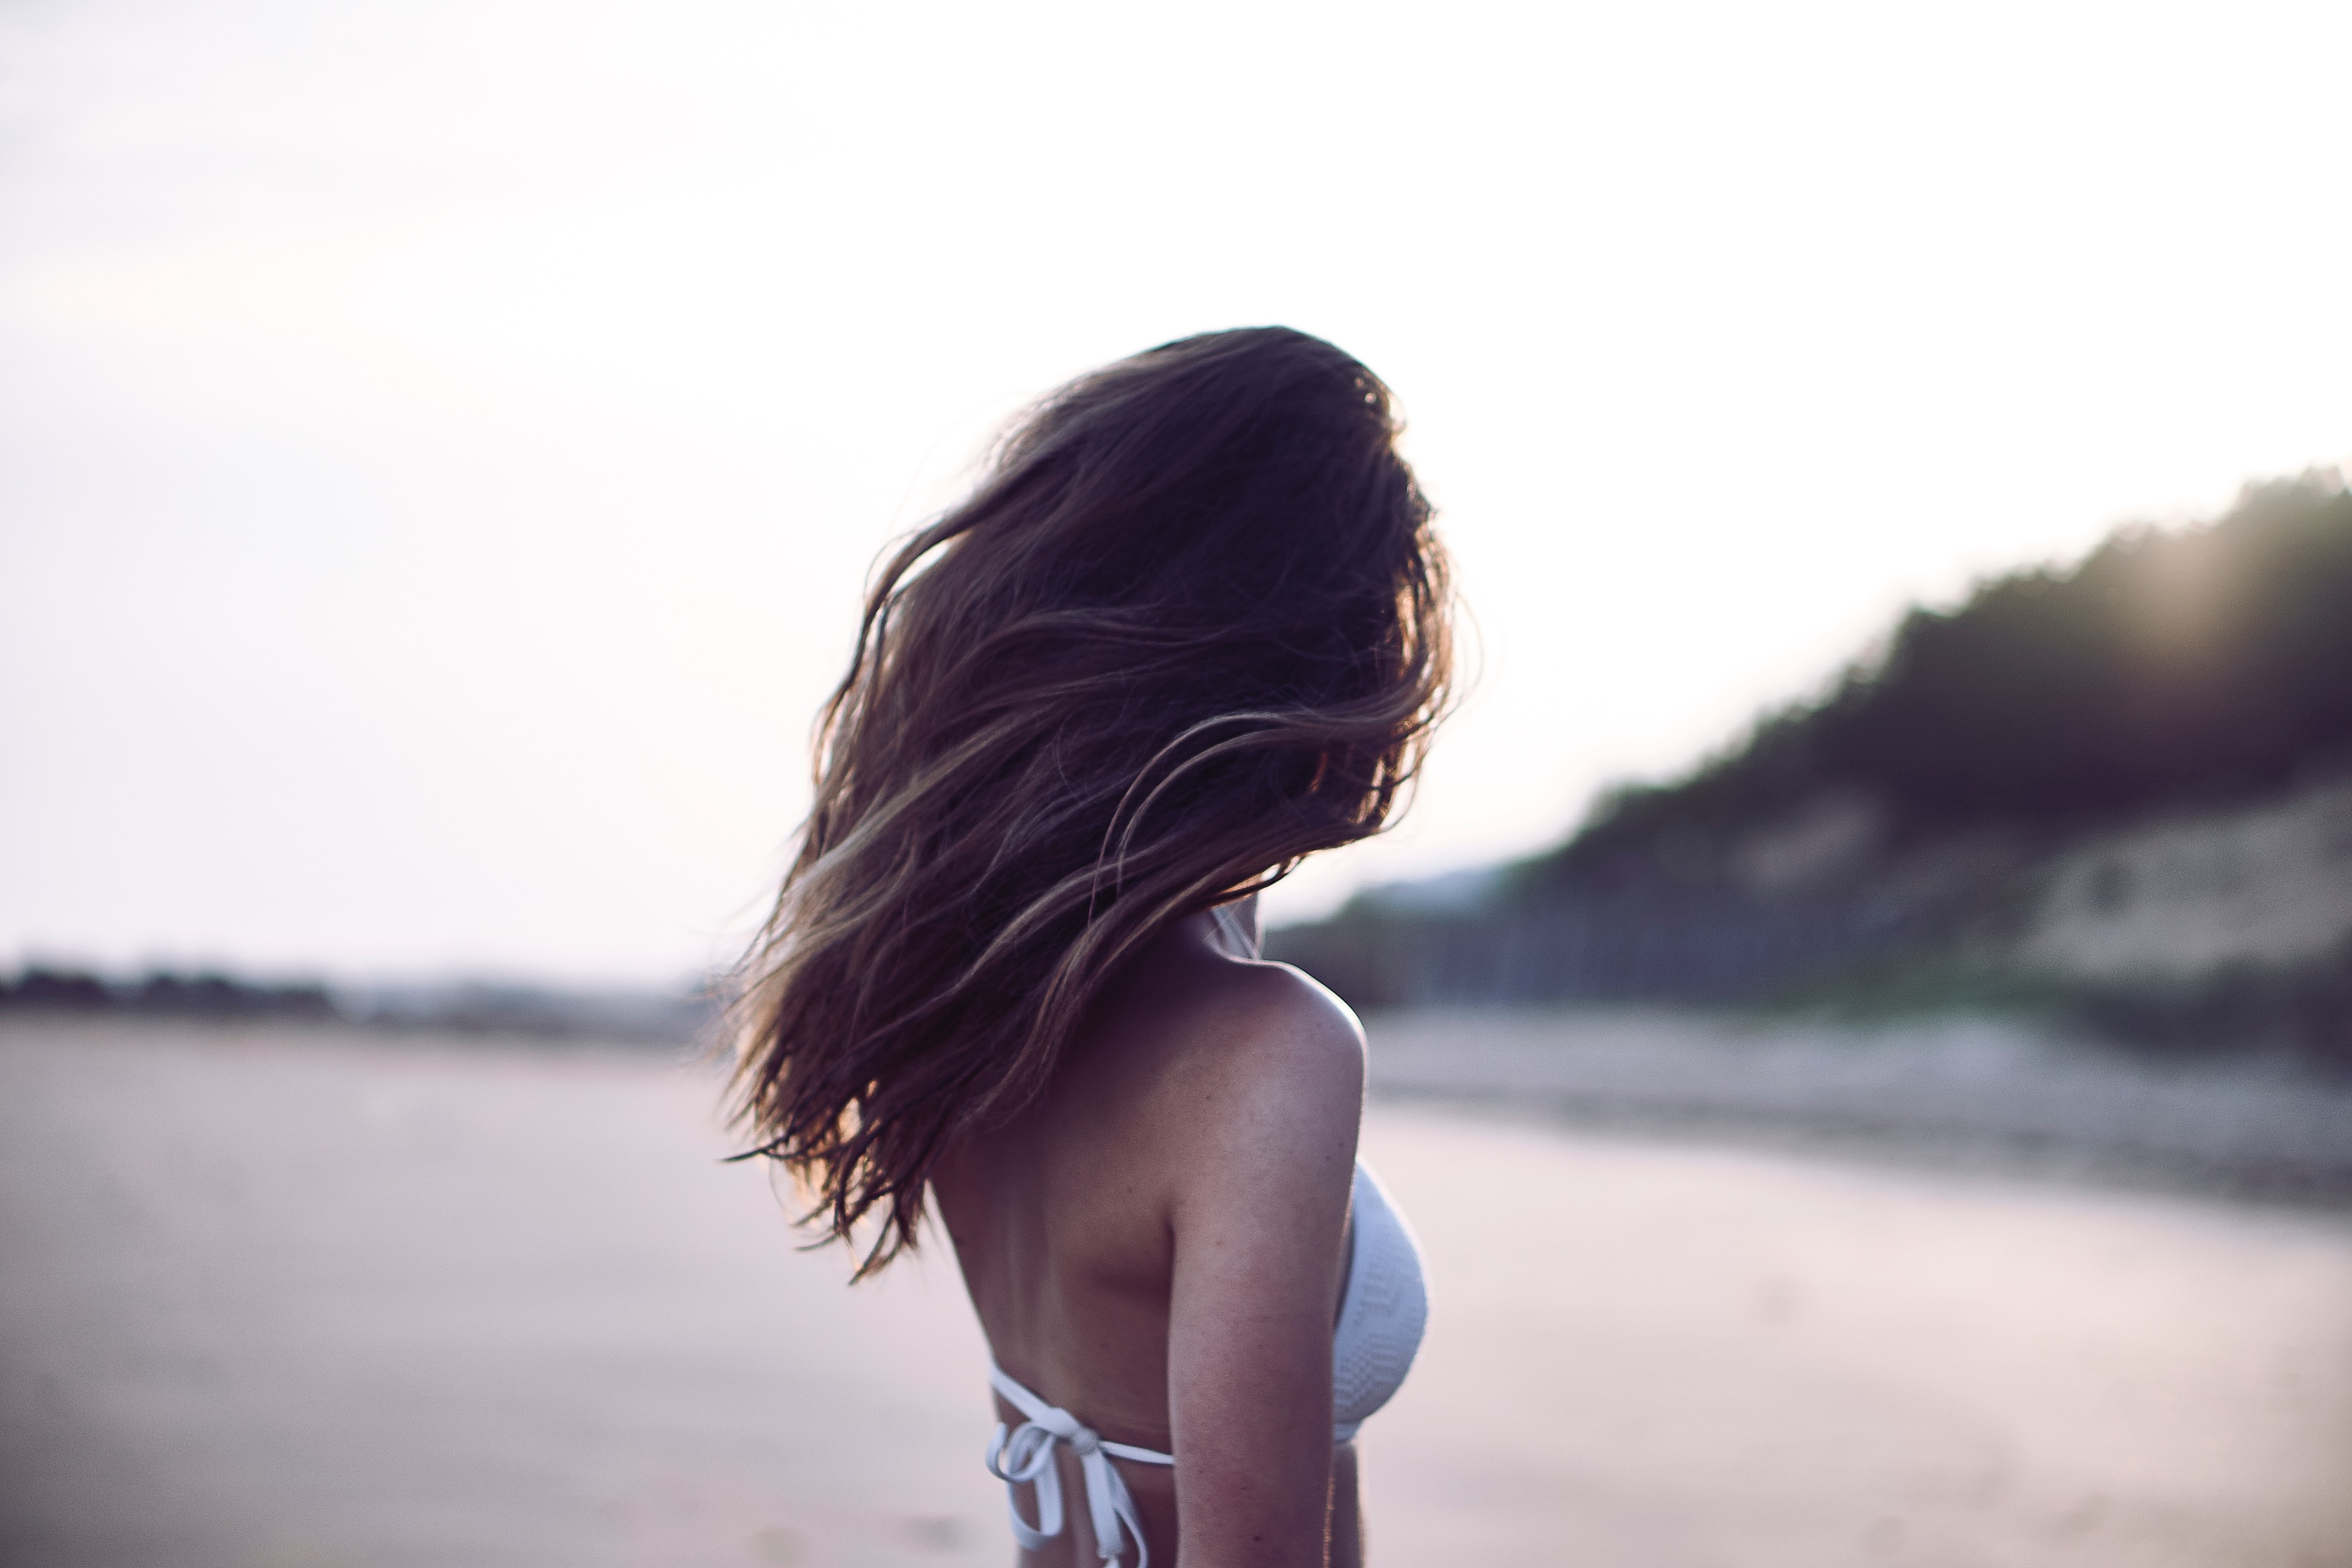 woman with full head of hair on beach